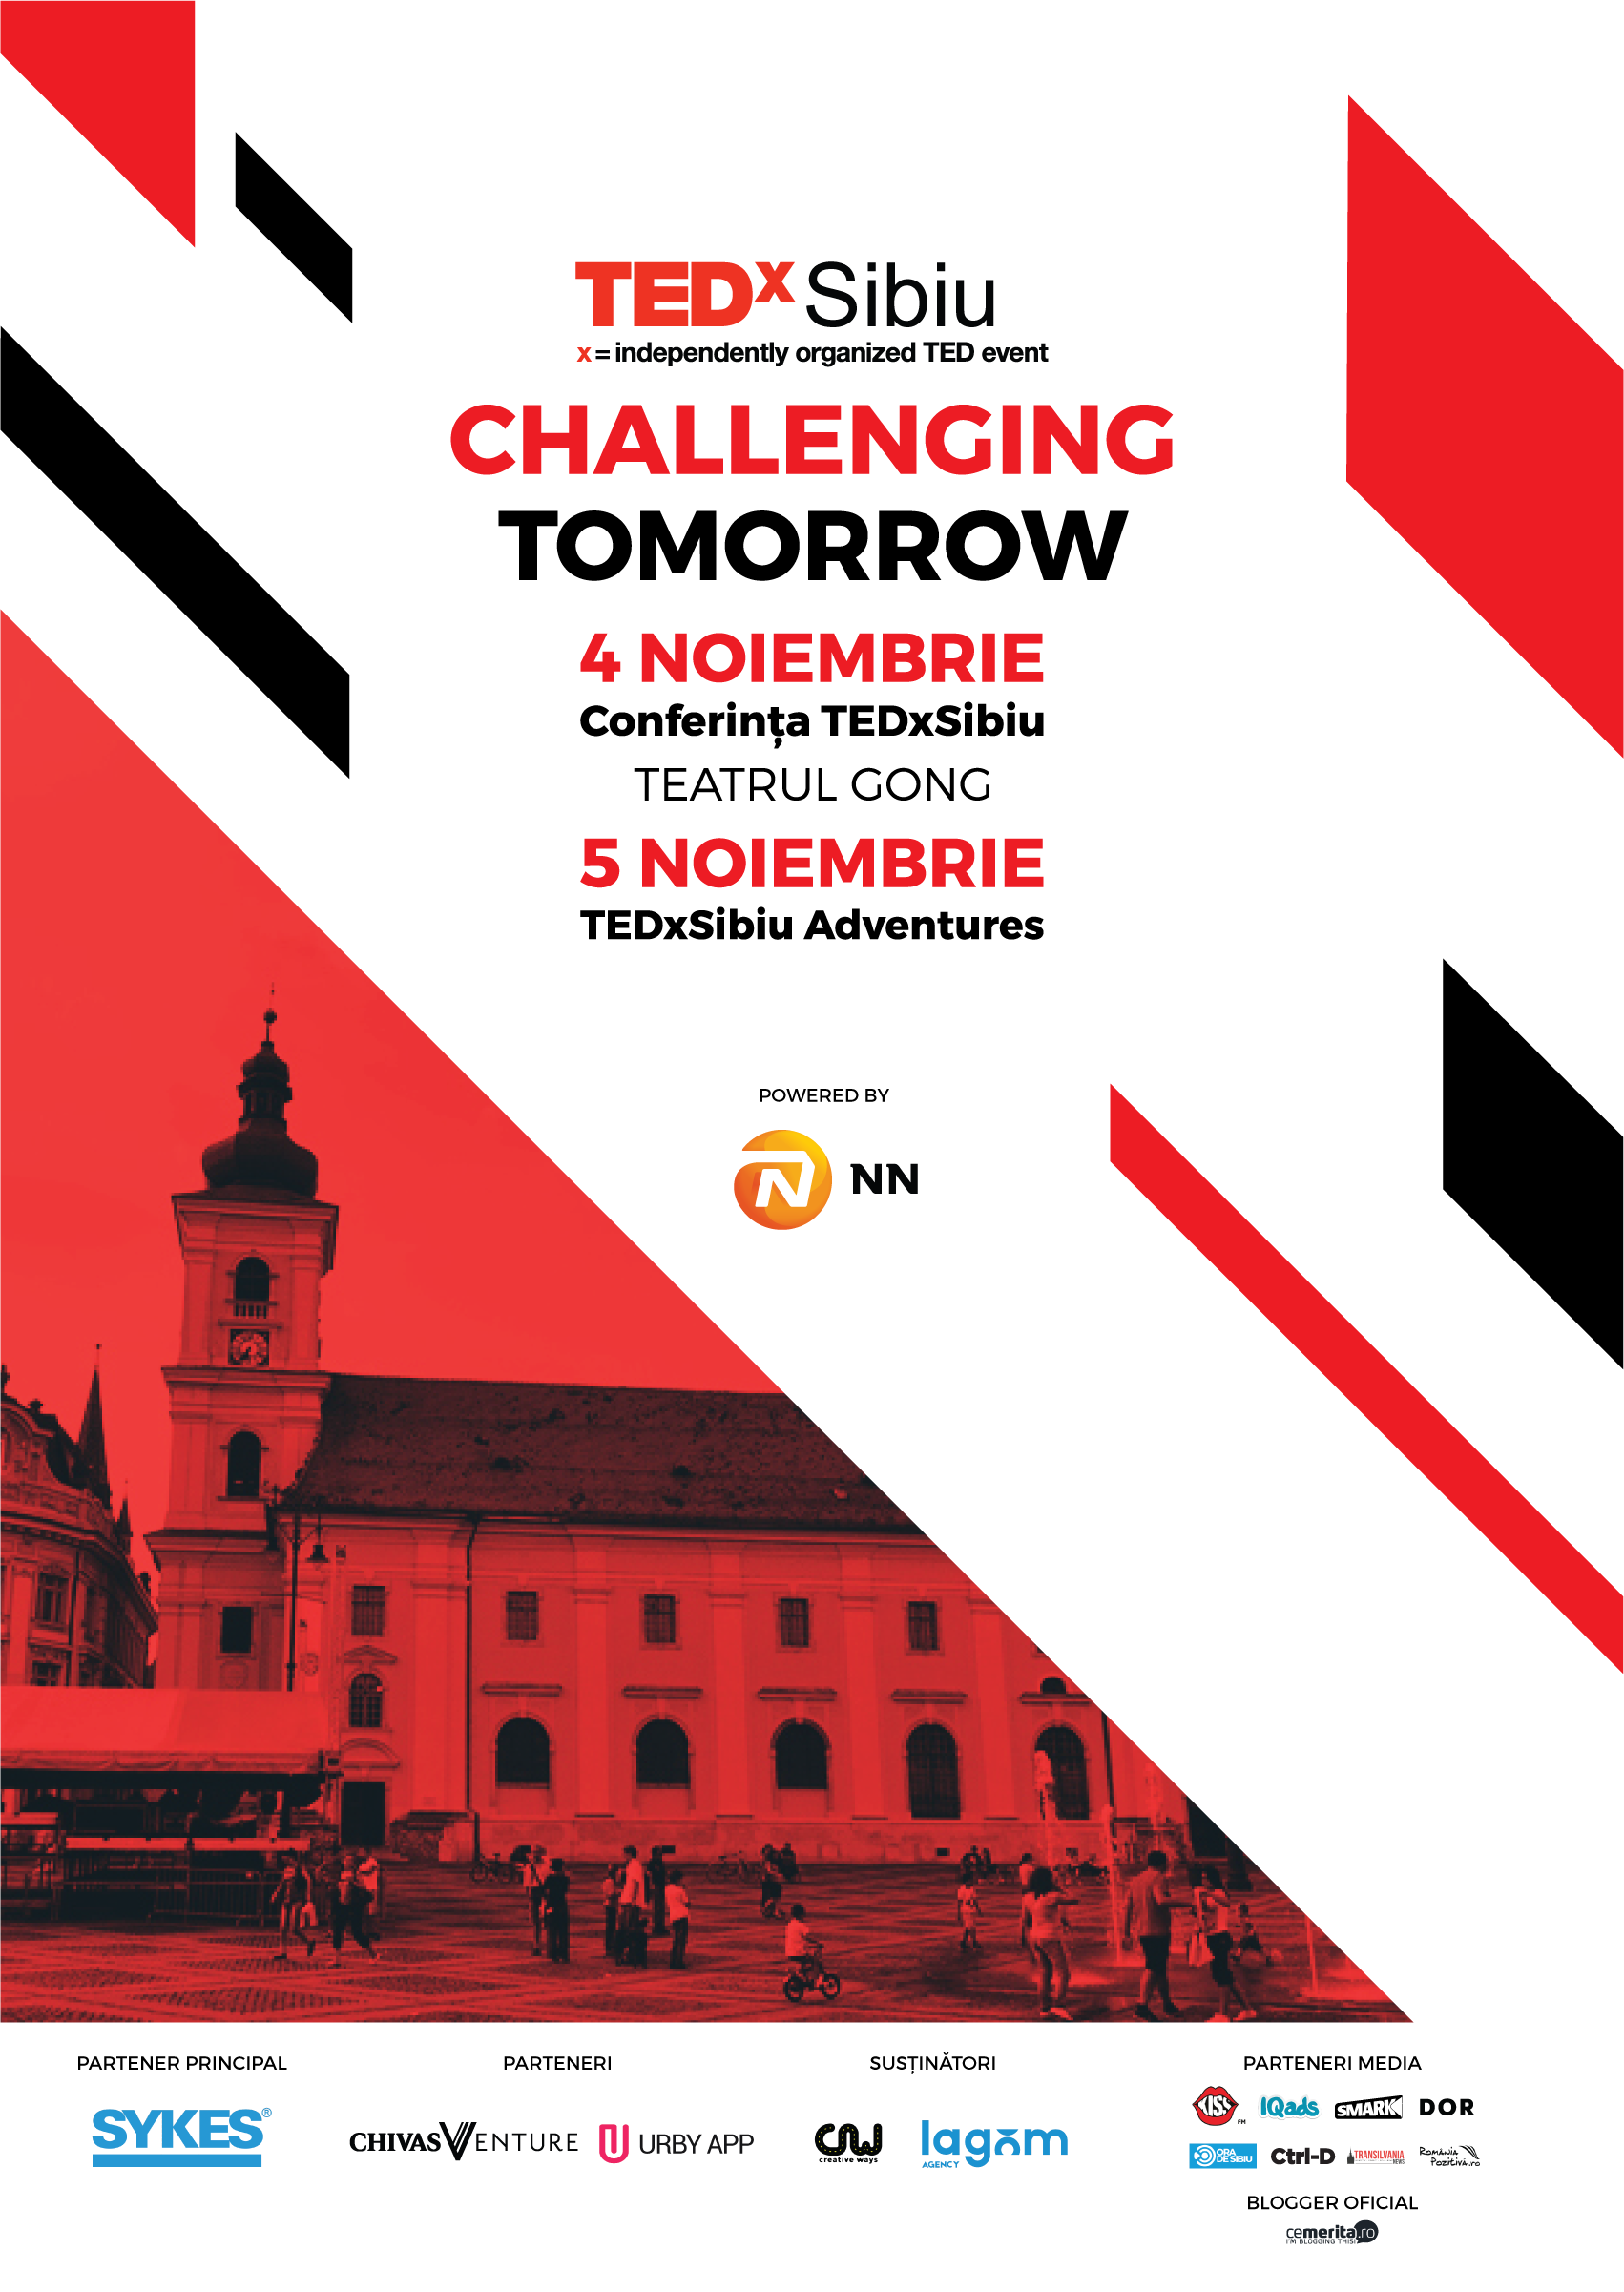 TEDxSibiu Challenging Tomorrow